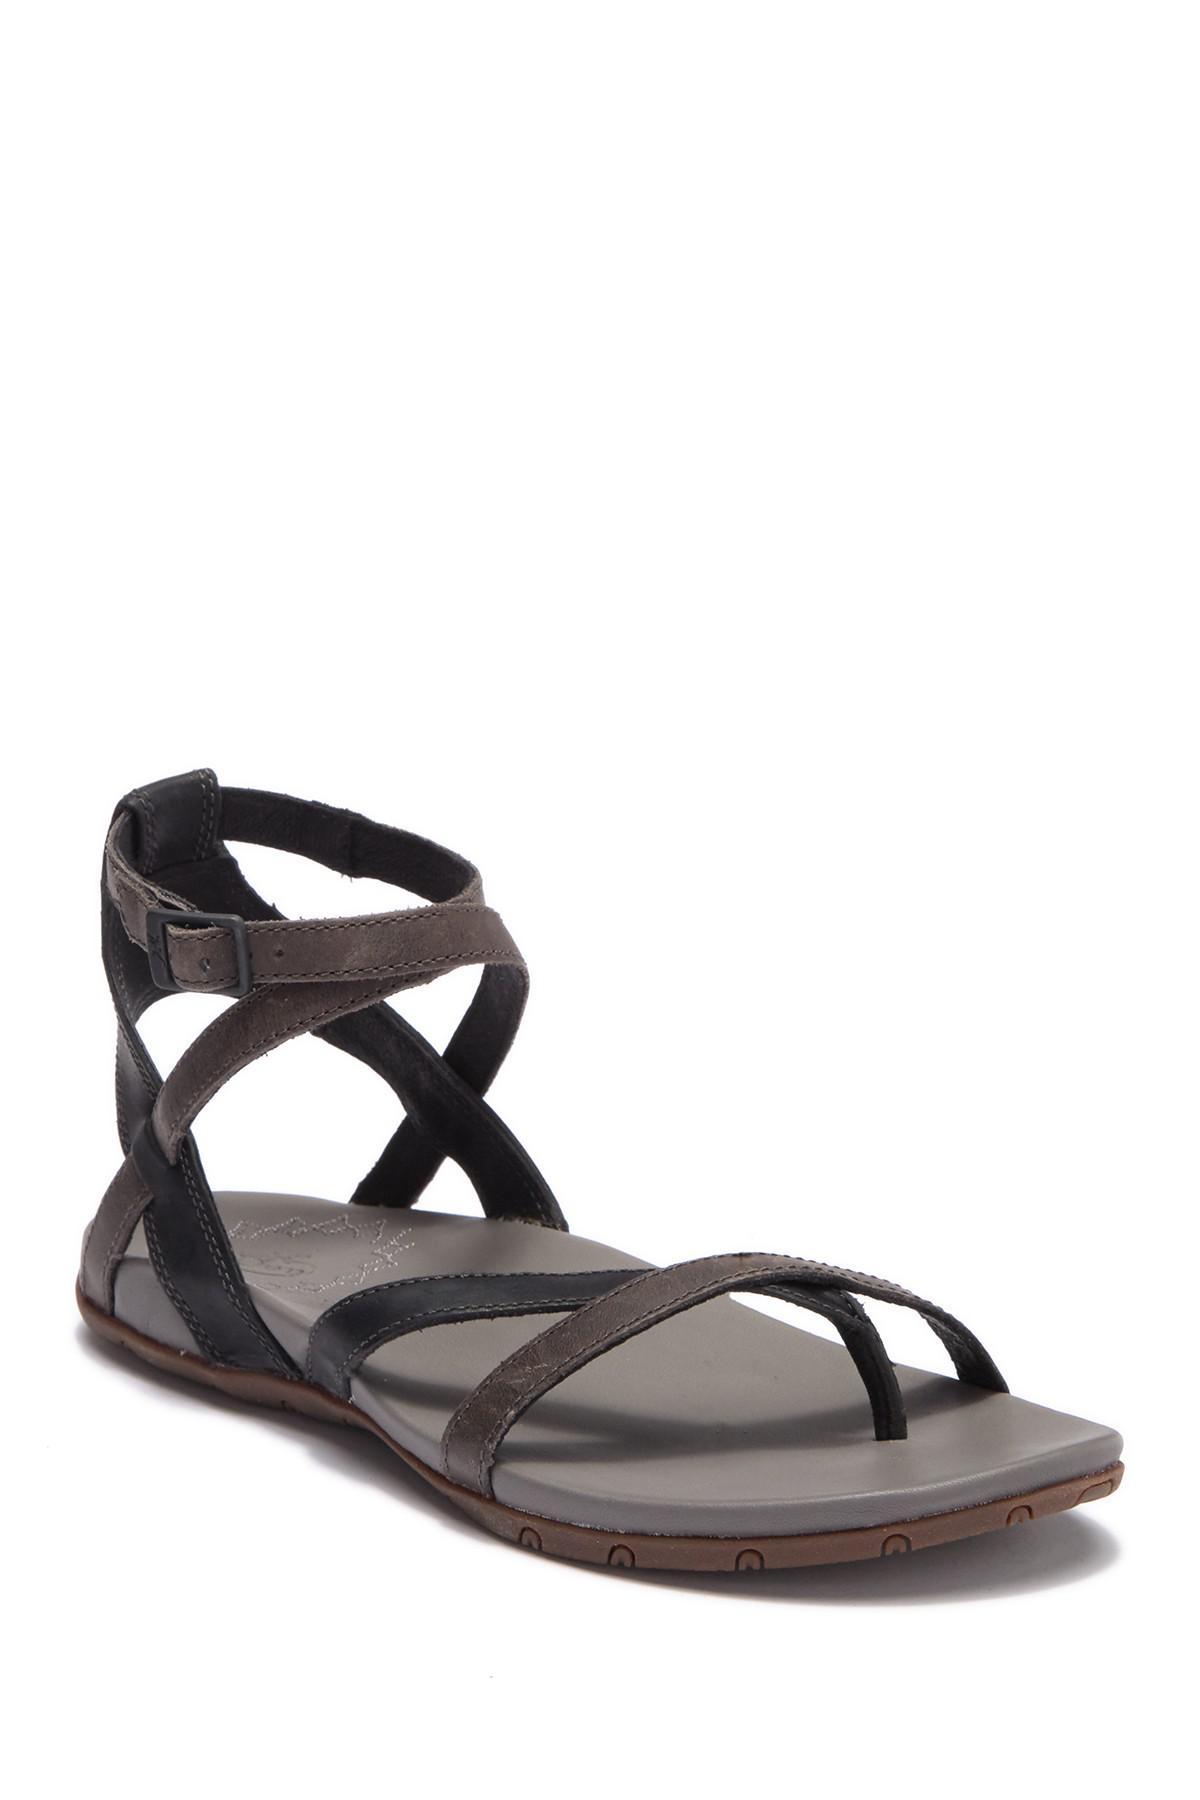 0a43cff1125b Lyst - Chaco Juniper Leather Sandal in Black